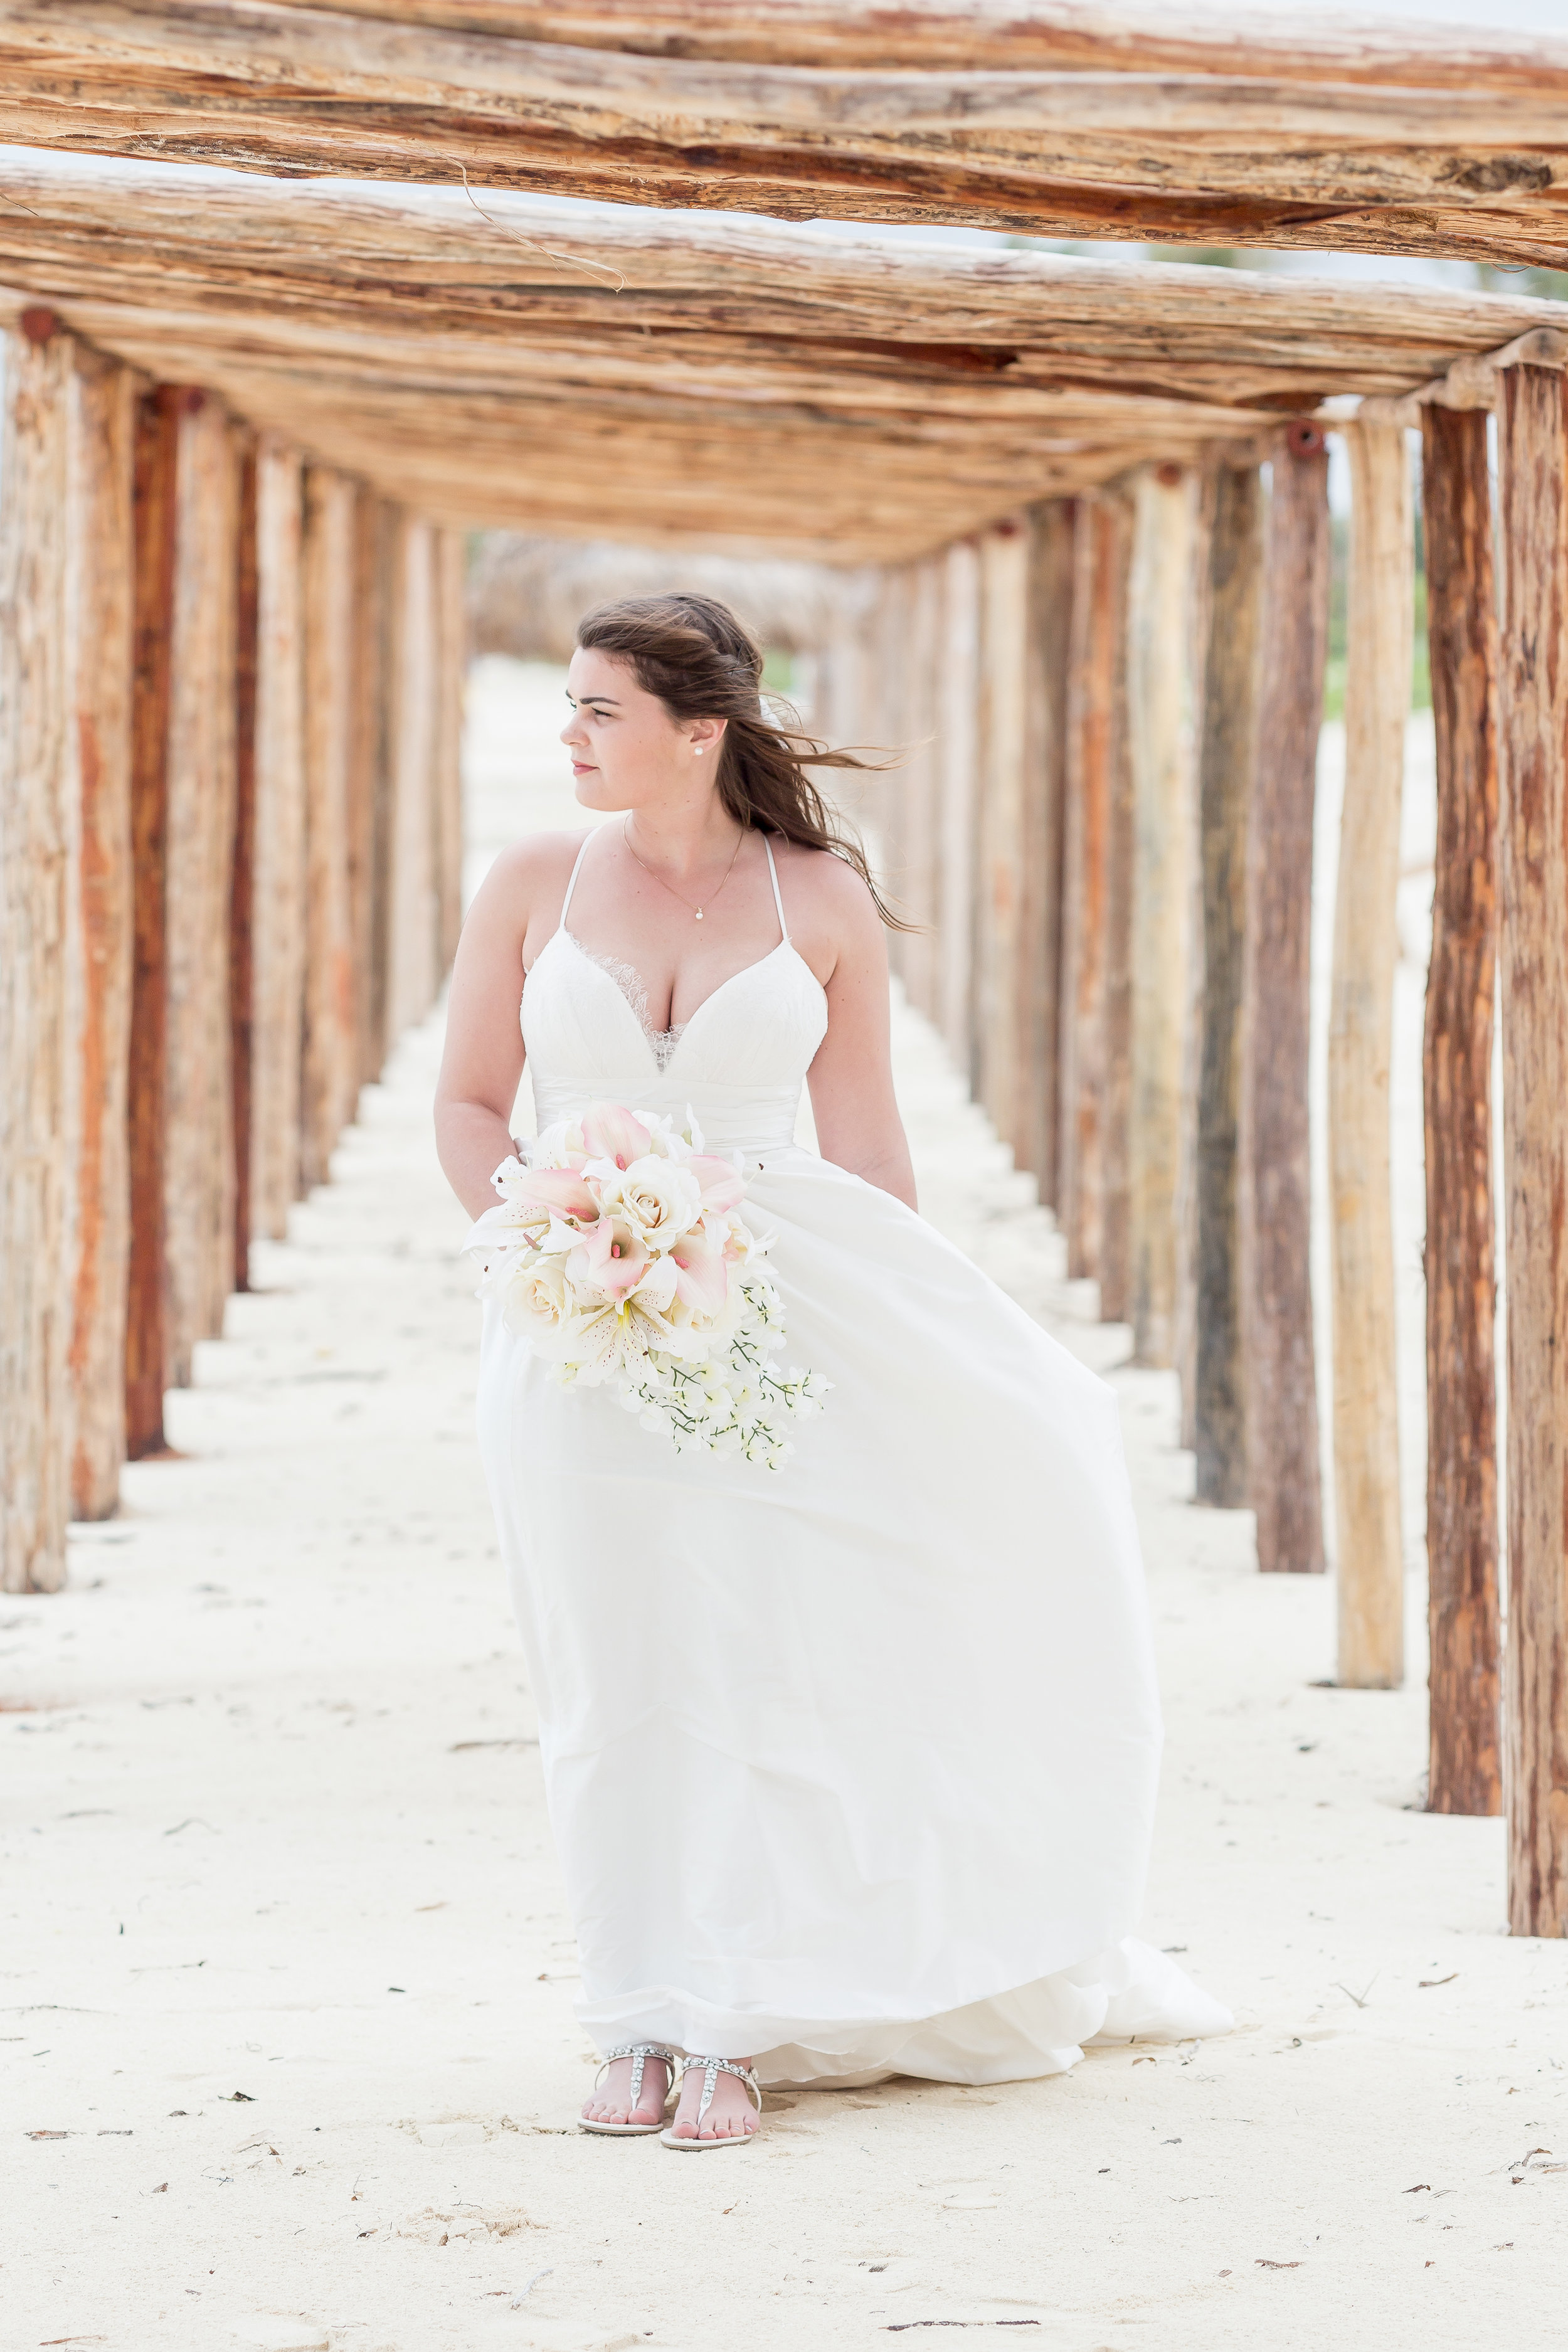 Cayco-Coco-Cuba-Wedding-180.jpg